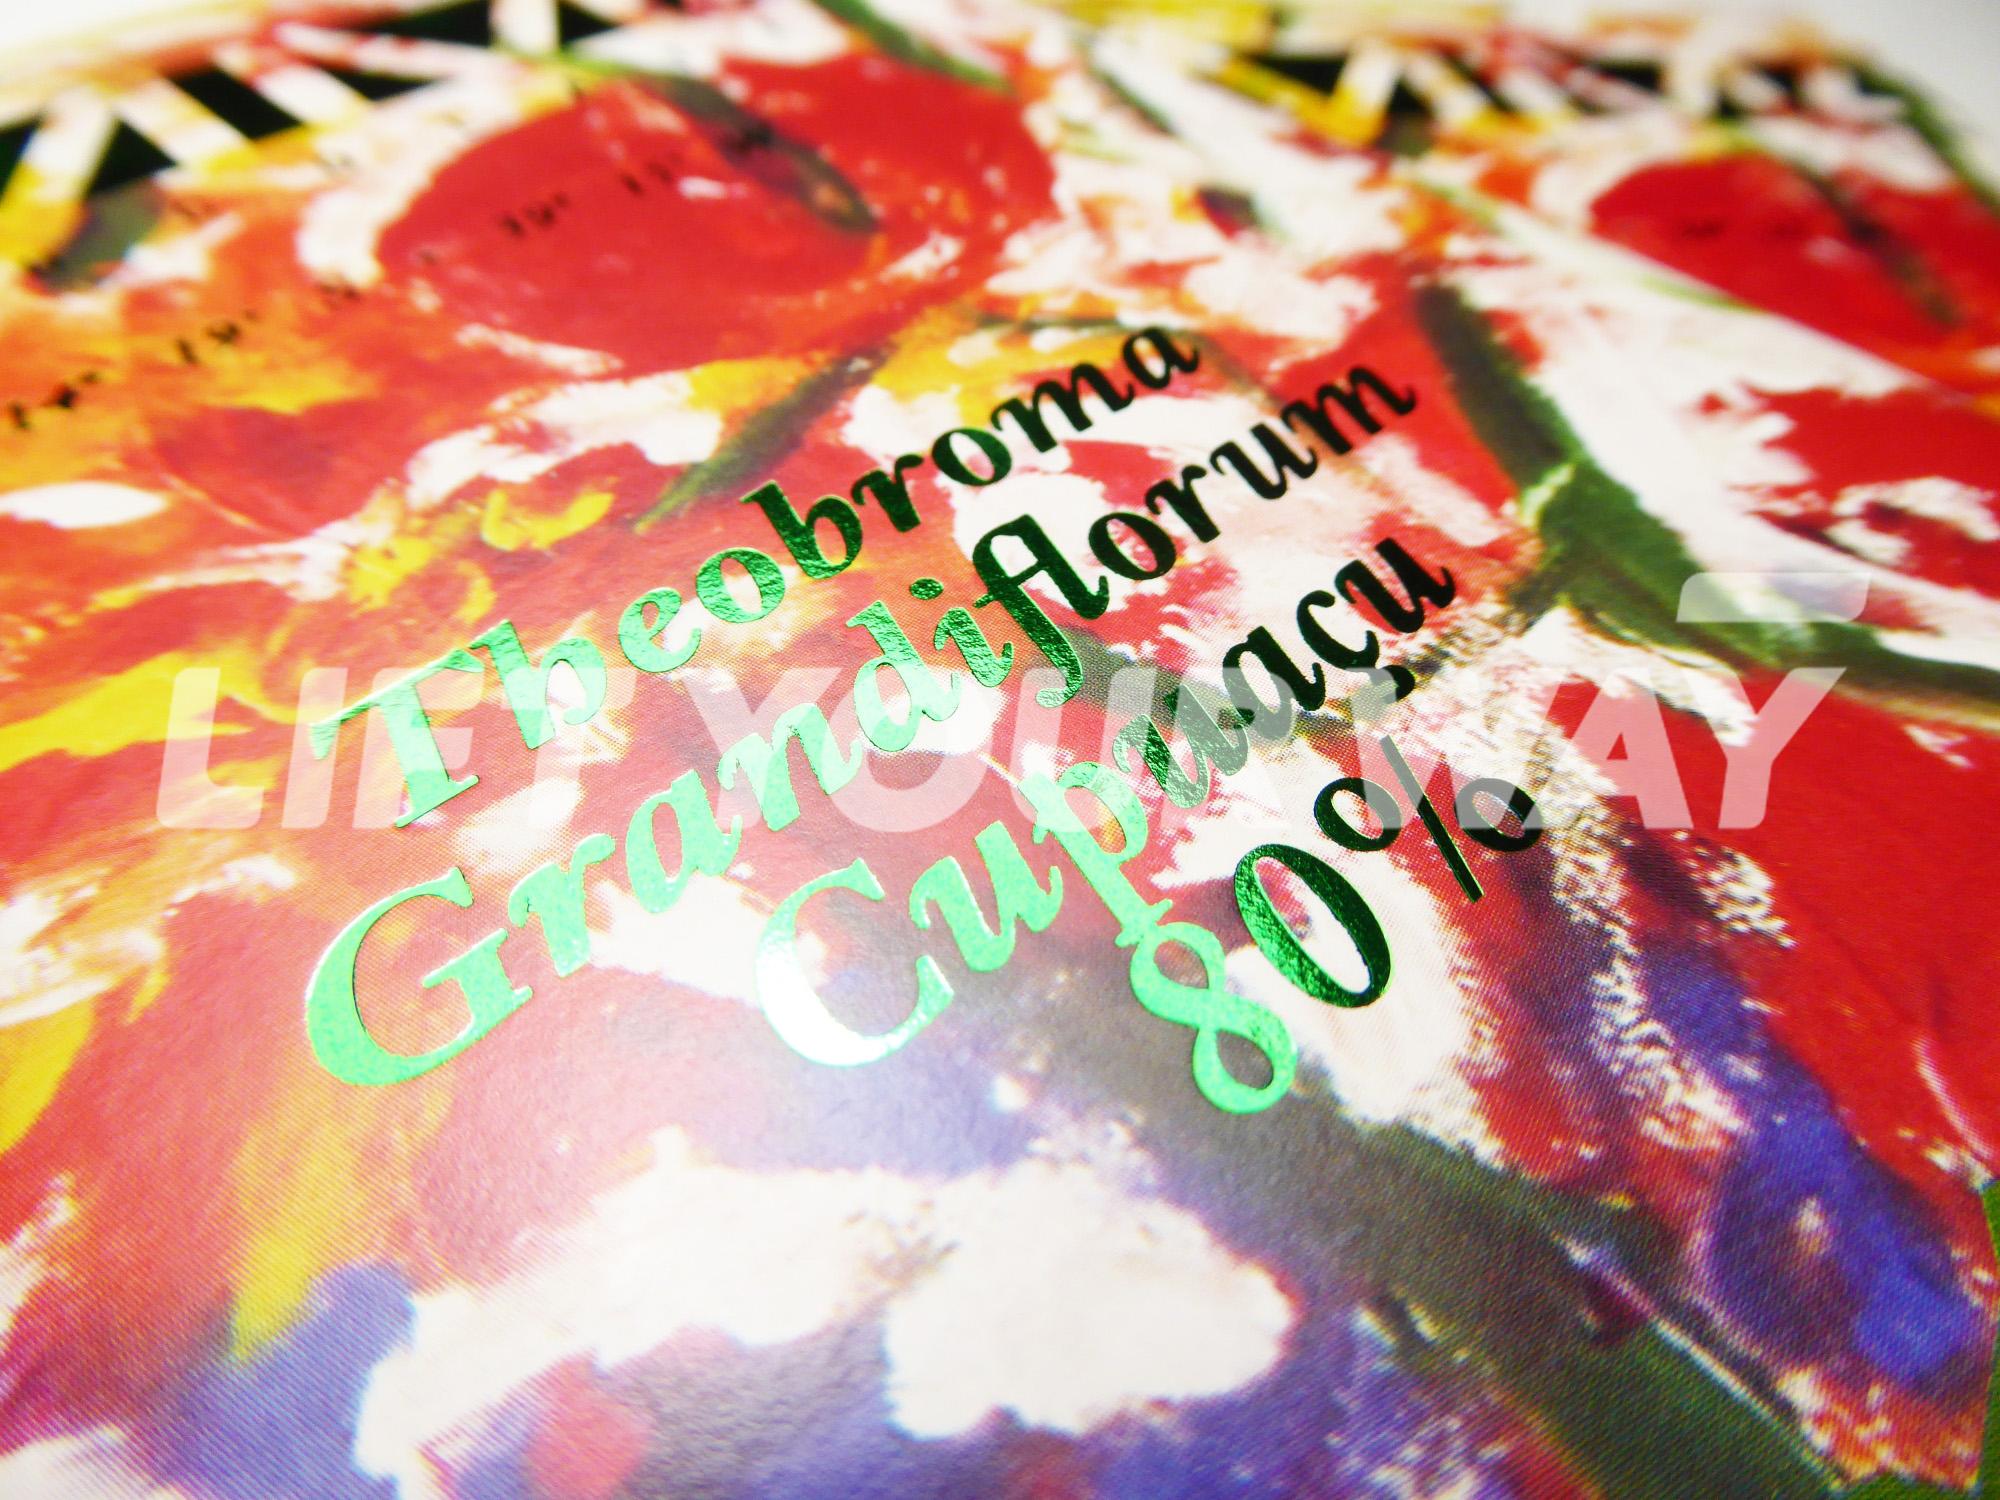 Theobroma Grandflorum